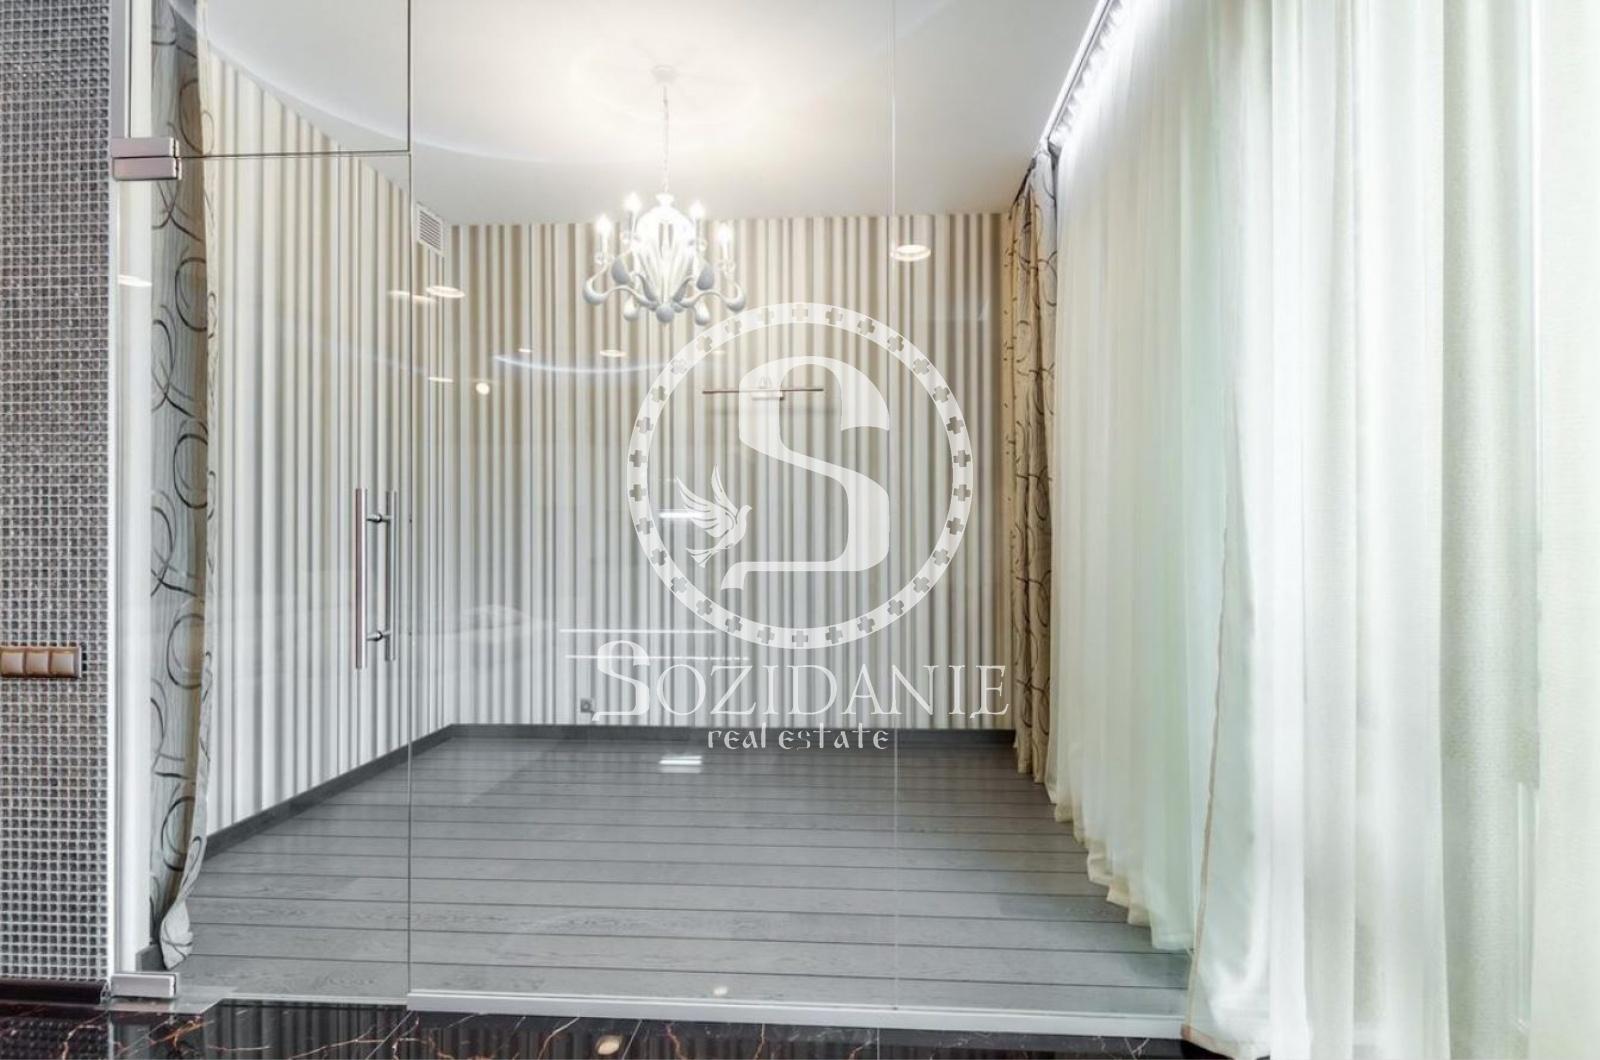 4 Комнаты, Городская, Аренда, Казарменный переулок, Listing ID 3648, Москва, Россия,